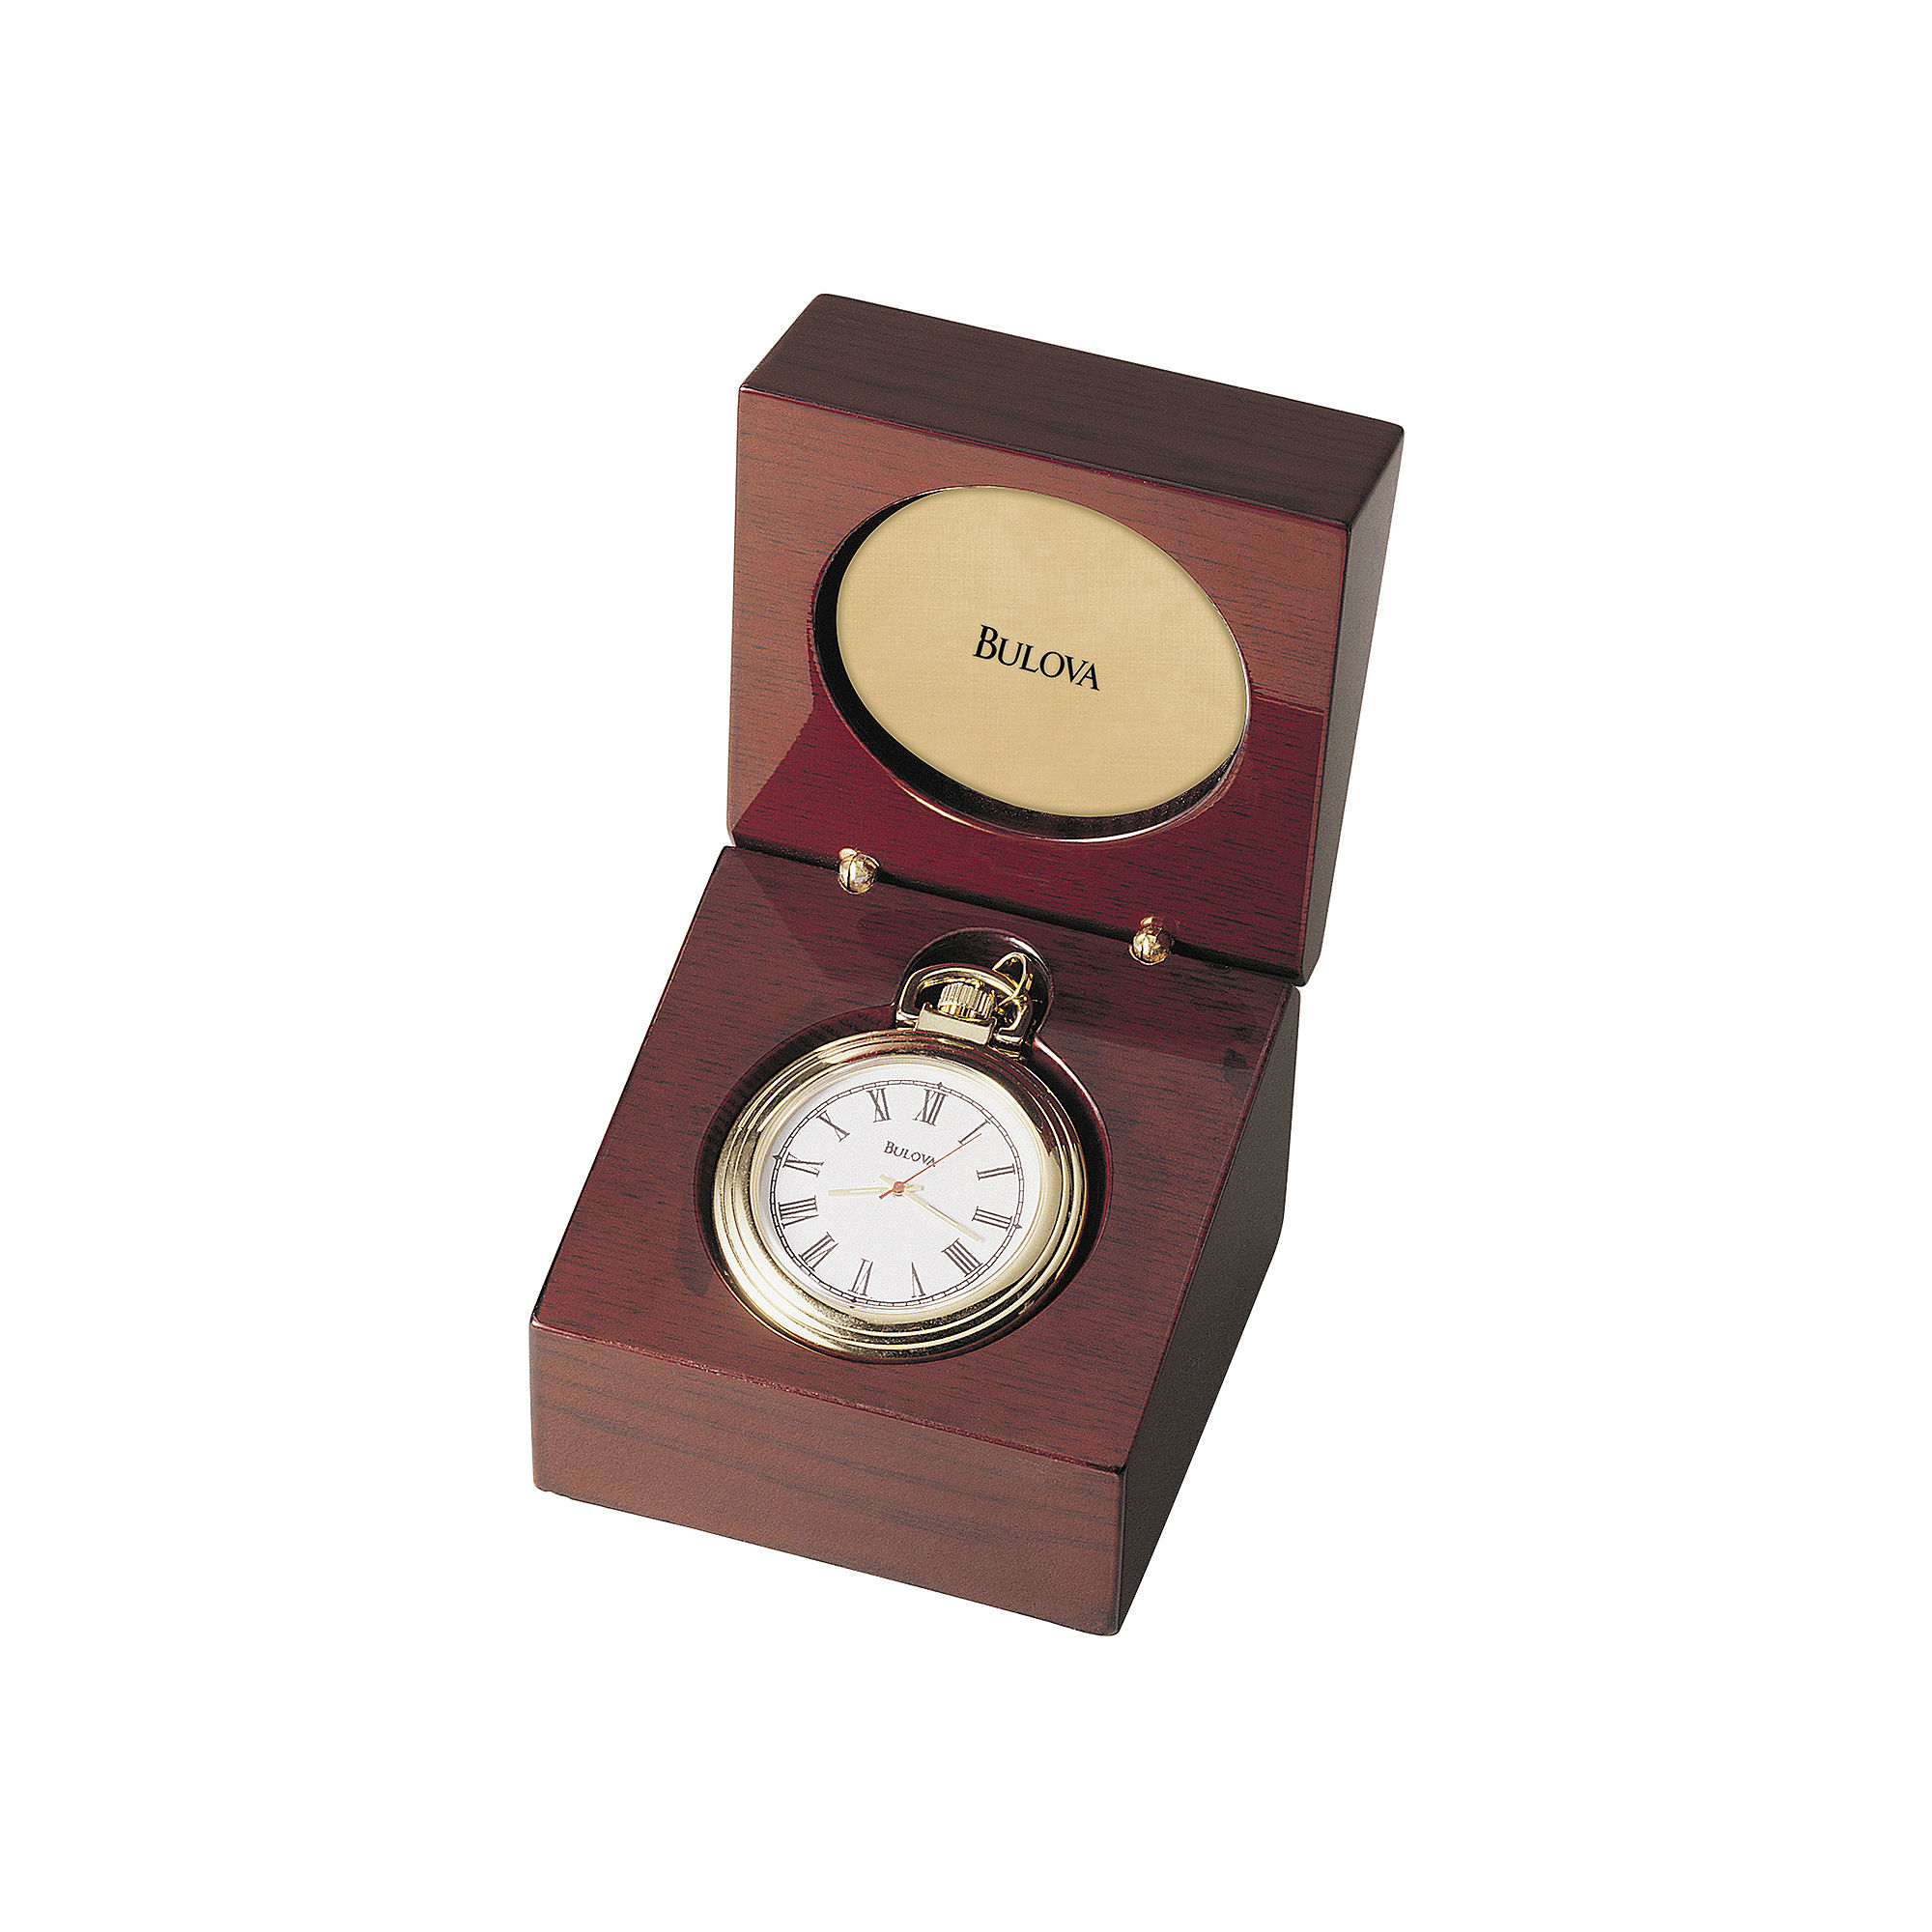 Bulova Aston Convertible Table Clock Pocket Watch